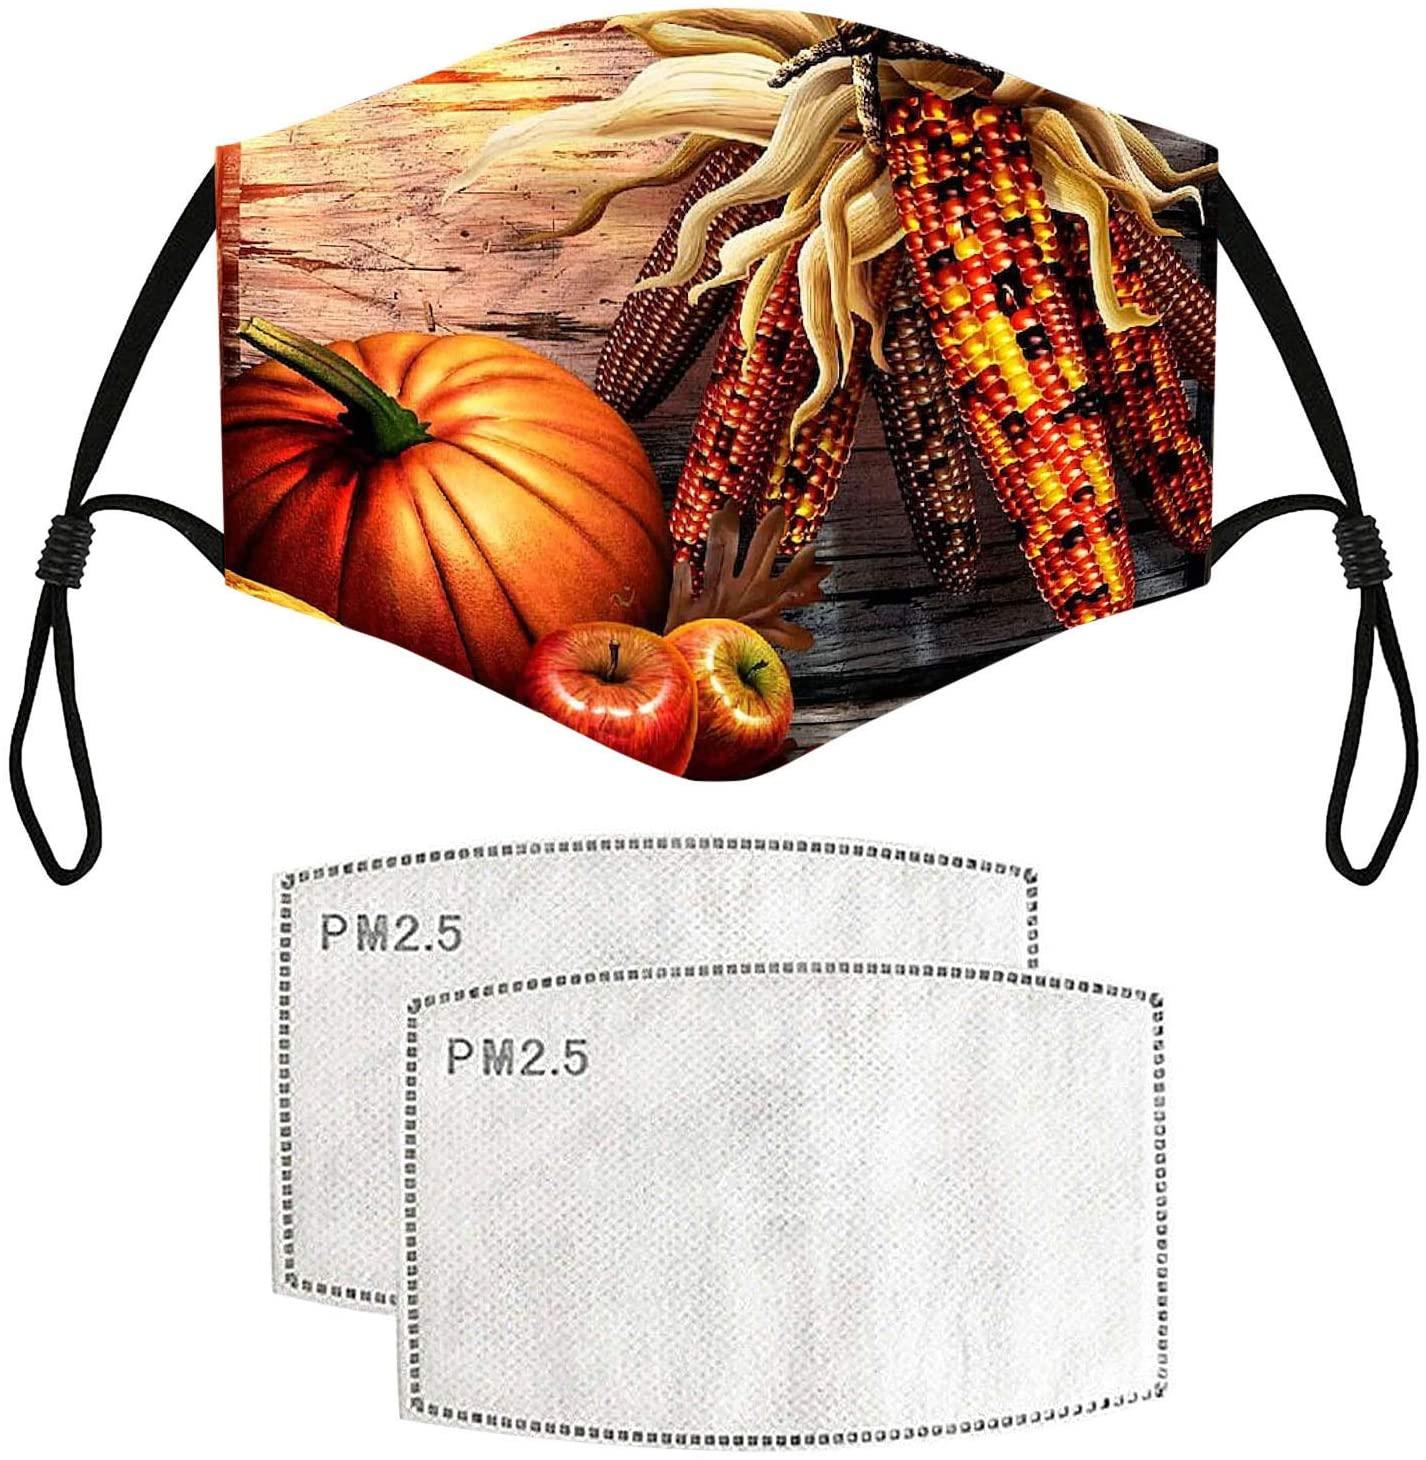 HheJIshirc 1/5PC Thanksgiving Day Masks,Washable and Rusable Print Vegetables and Fruits Masks, Adjustable Earloop Breathable Face Bandanas